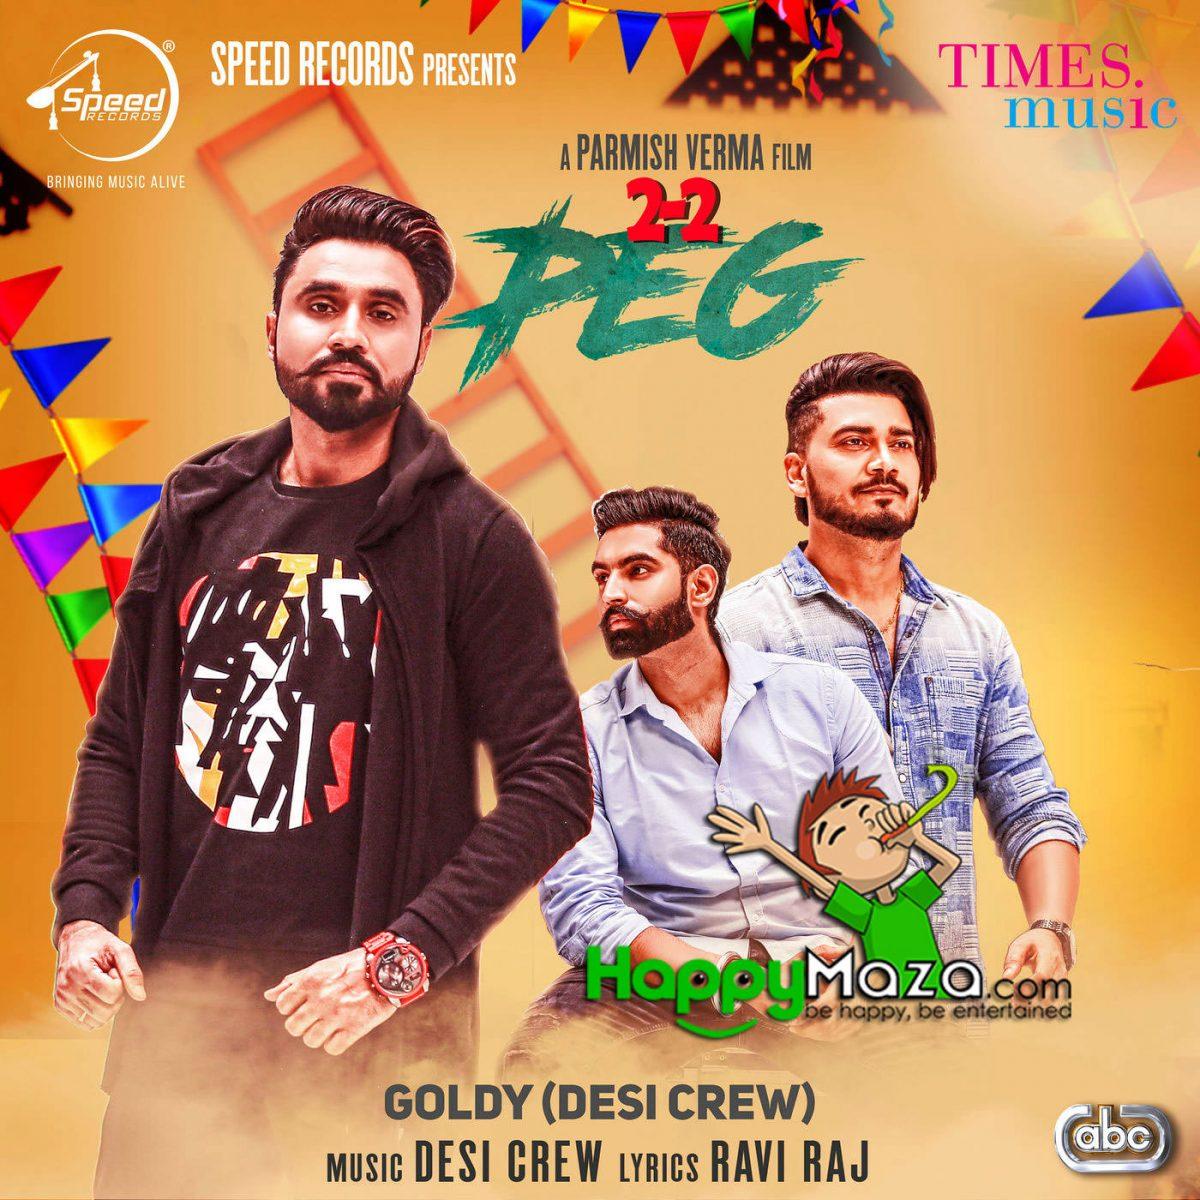 2-2 Peg Lyrics – Goldy Desi Crew – 2018